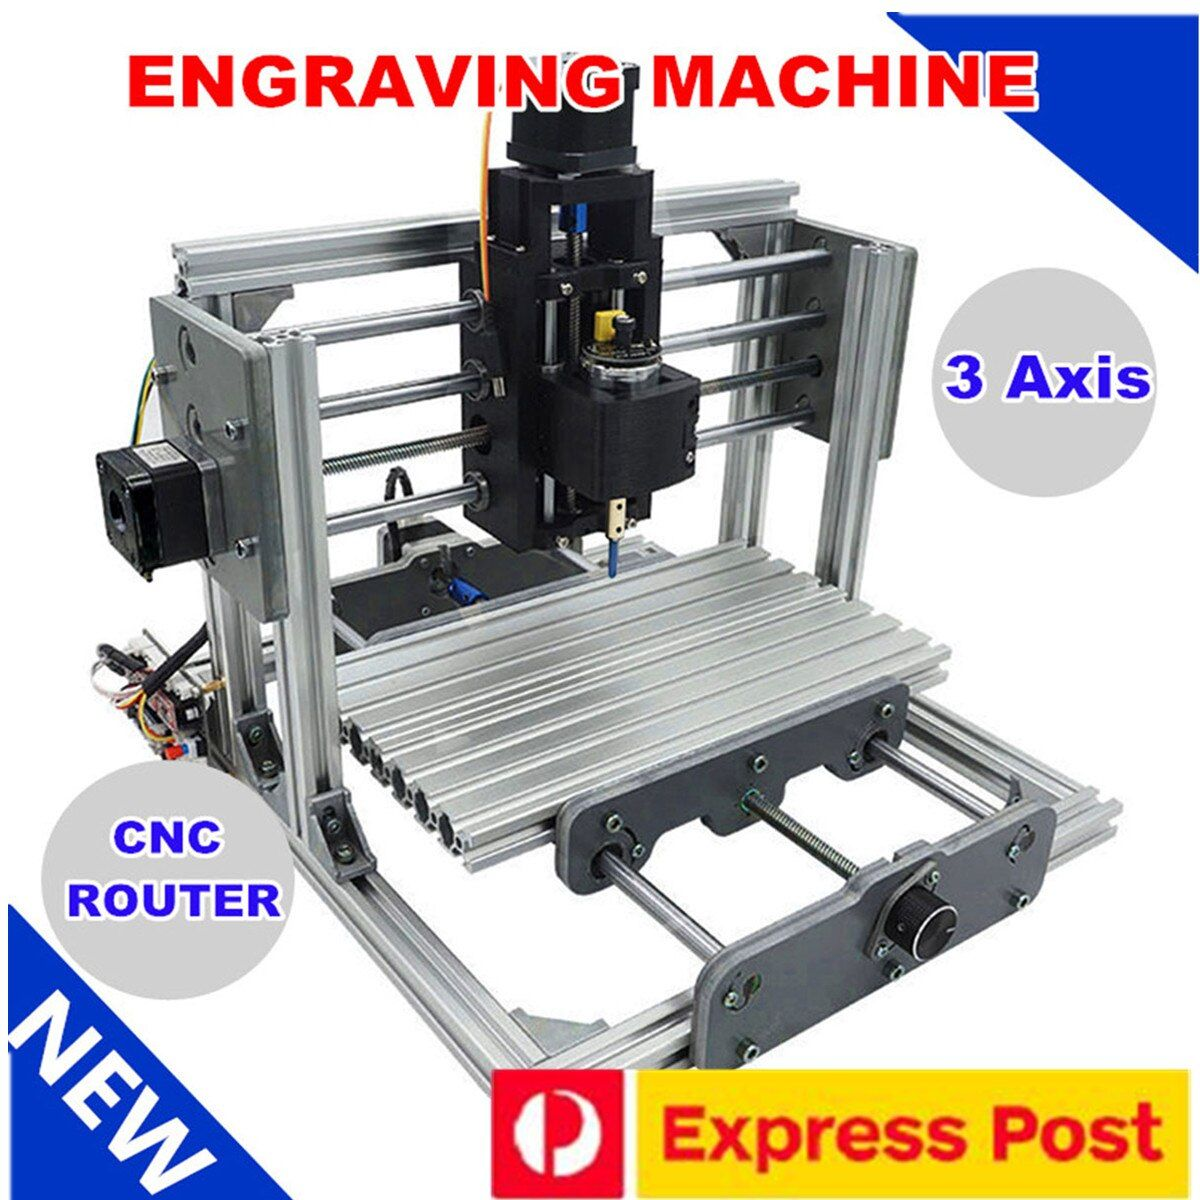 2417 3 achse Mini DIY CNC Router Holz Verlangen Gravur Schneiden Fräsen Desktop Stecher Maschine 240x170x65mm